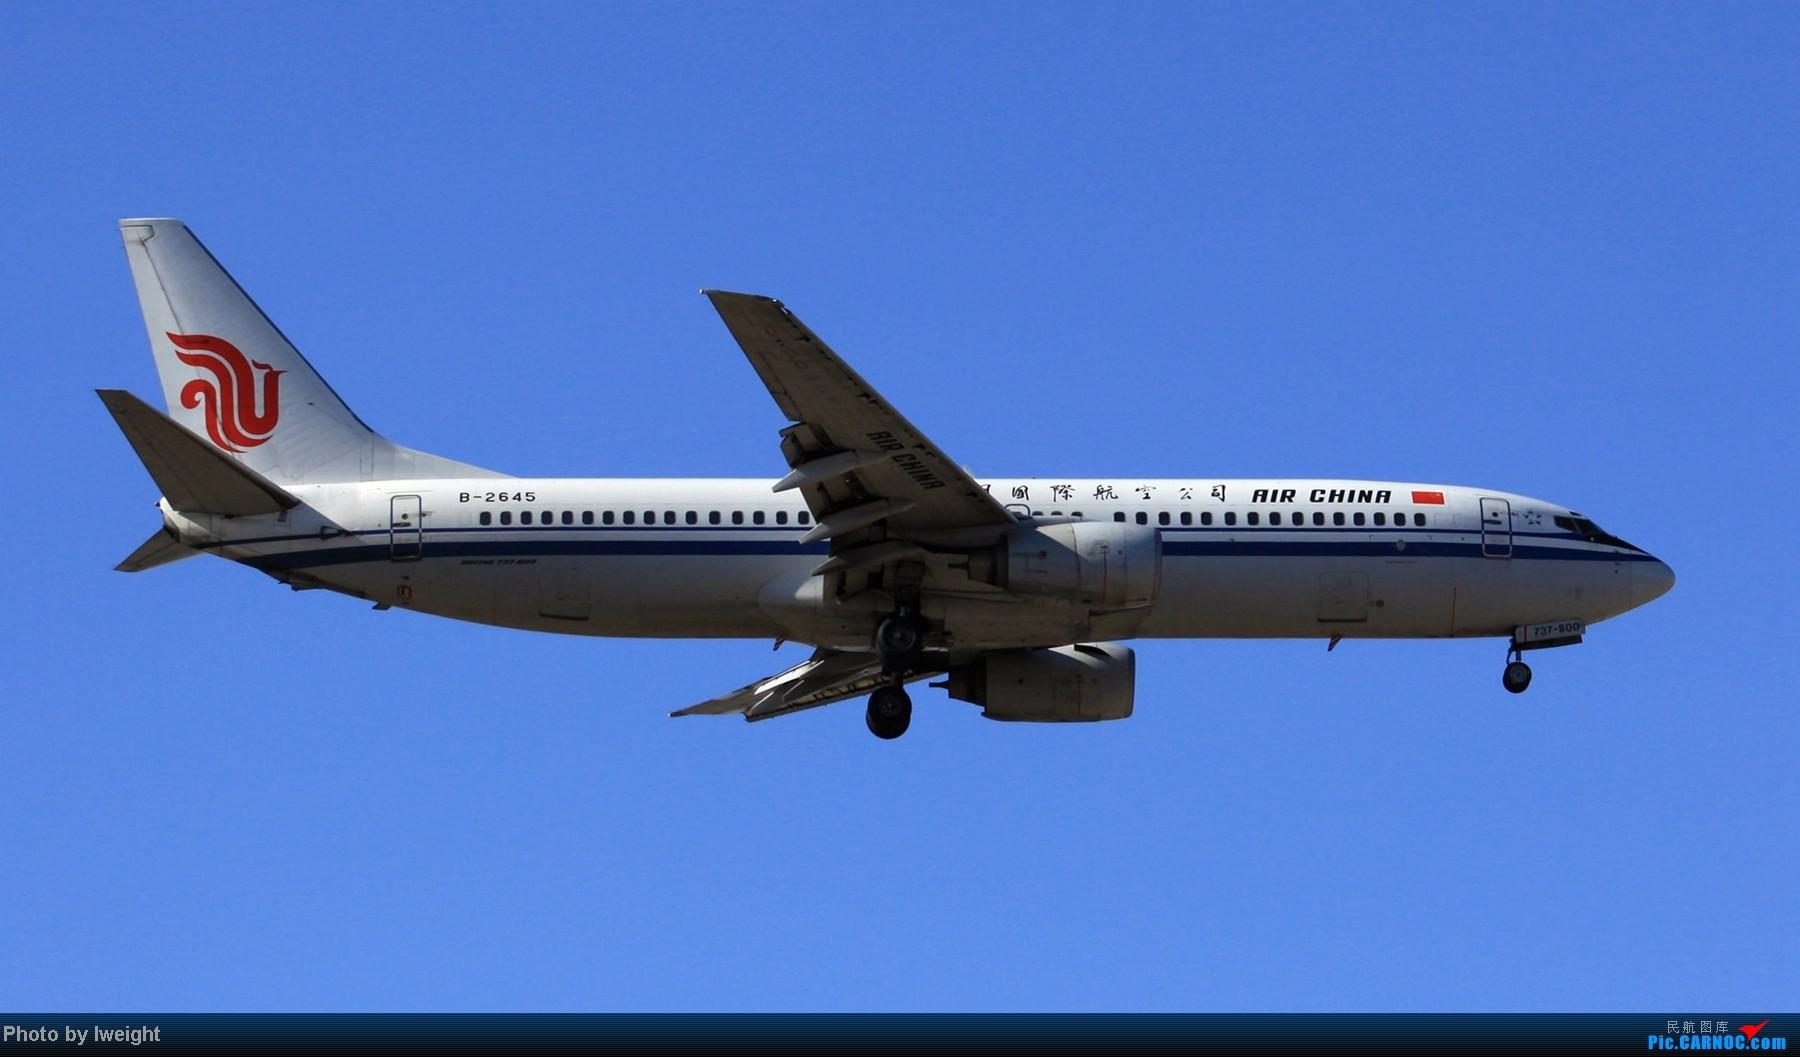 Re:[原创]春节期间首都机场拍机汇报 BOEING 737-800 B-2645 中国北京首都机场